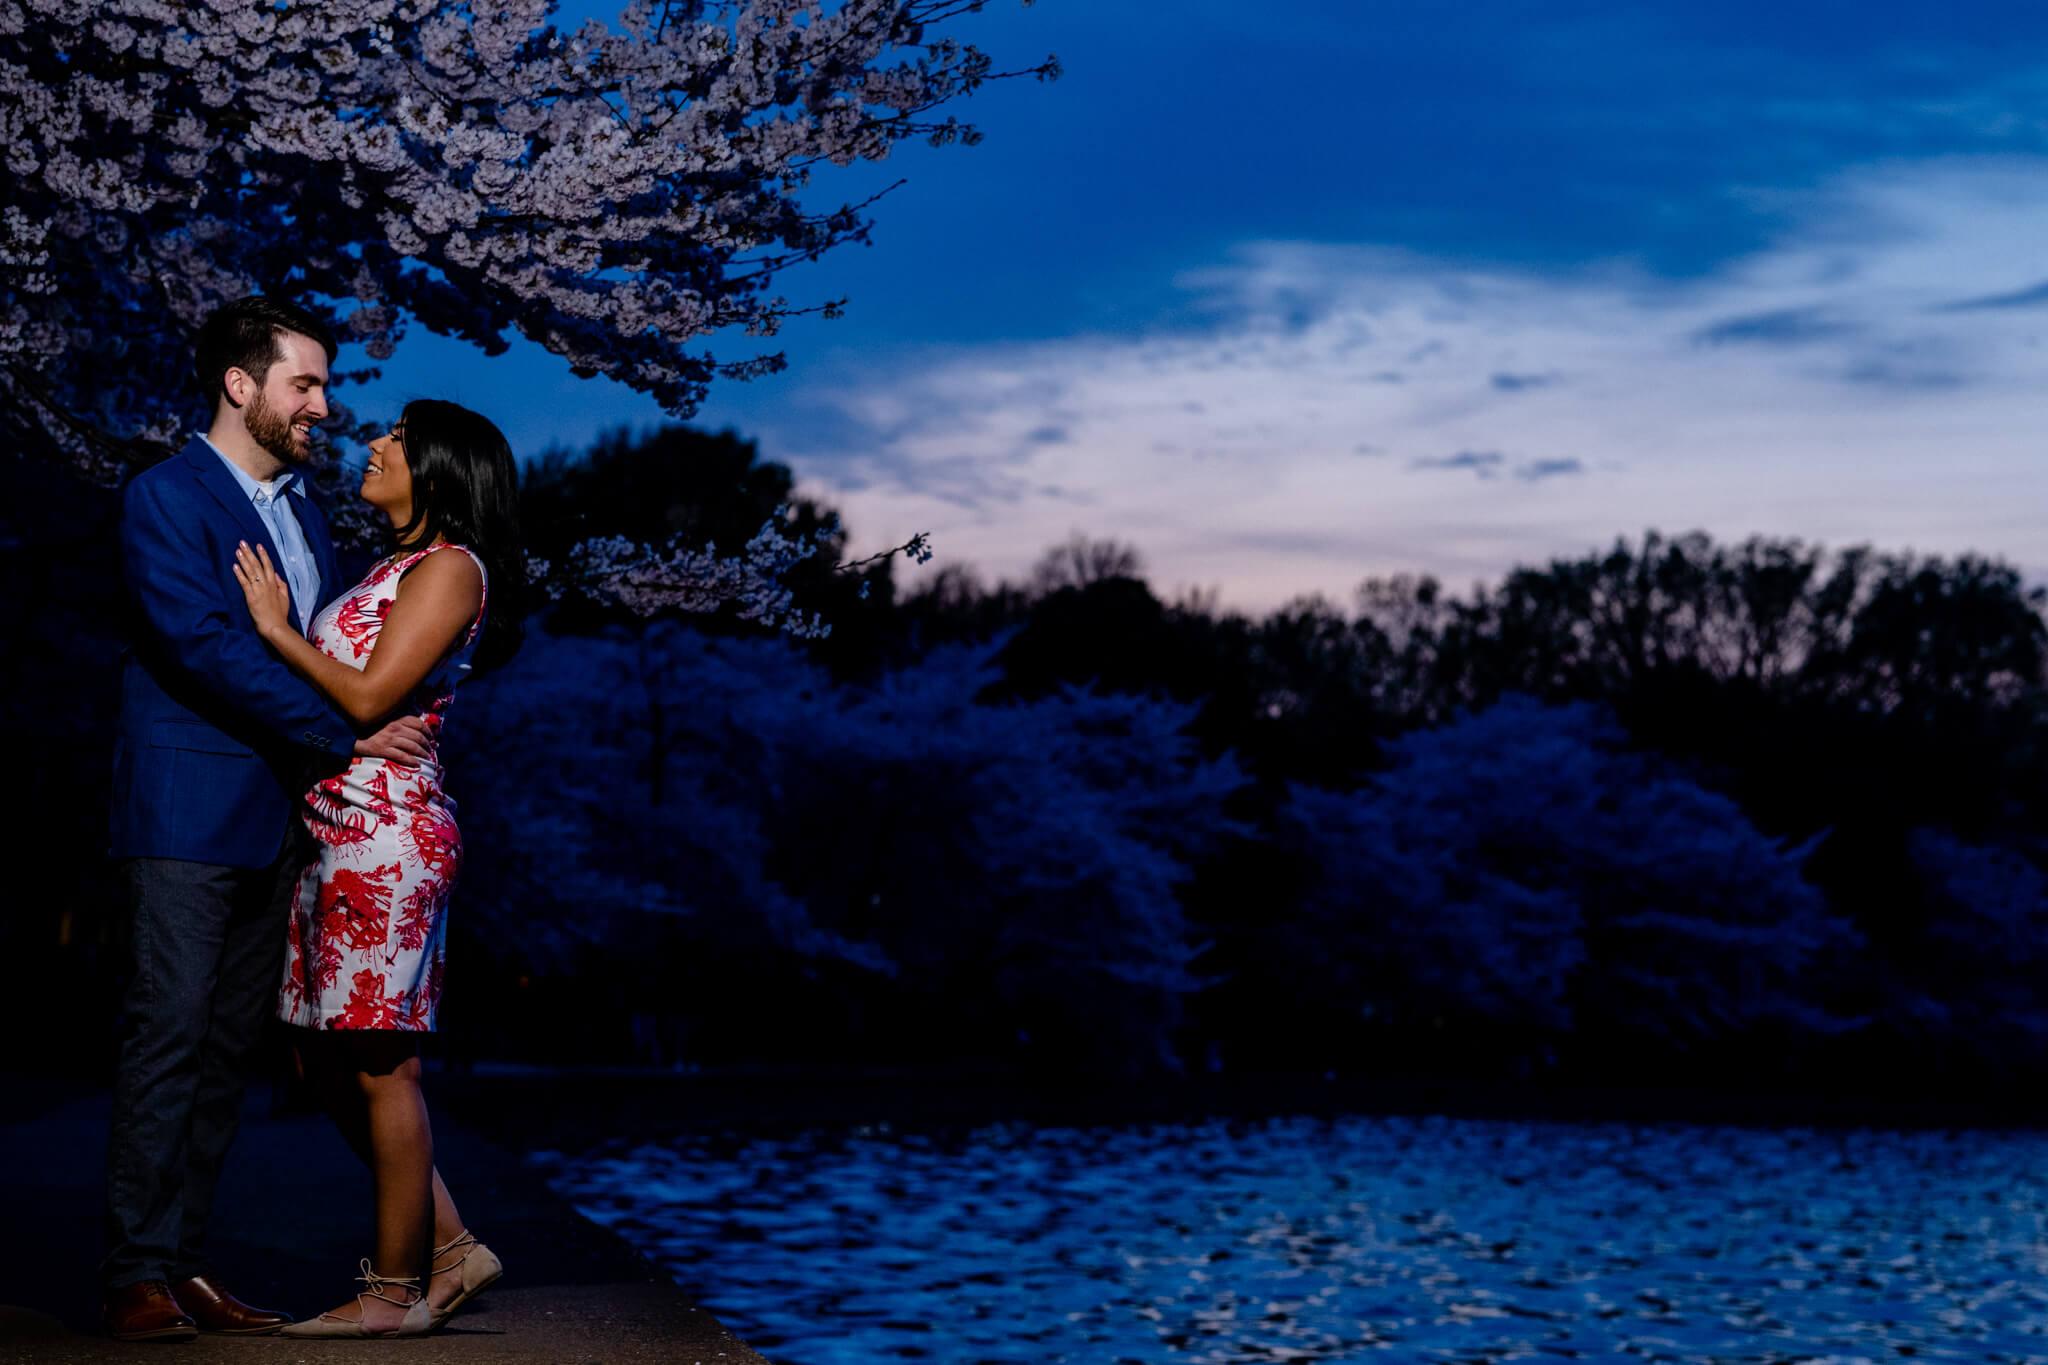 Danielle Michael DC Cherry Blossom Engagement Tidal Basin Washington Monument Engaged NYE Wedding Inspiration-2.jpg